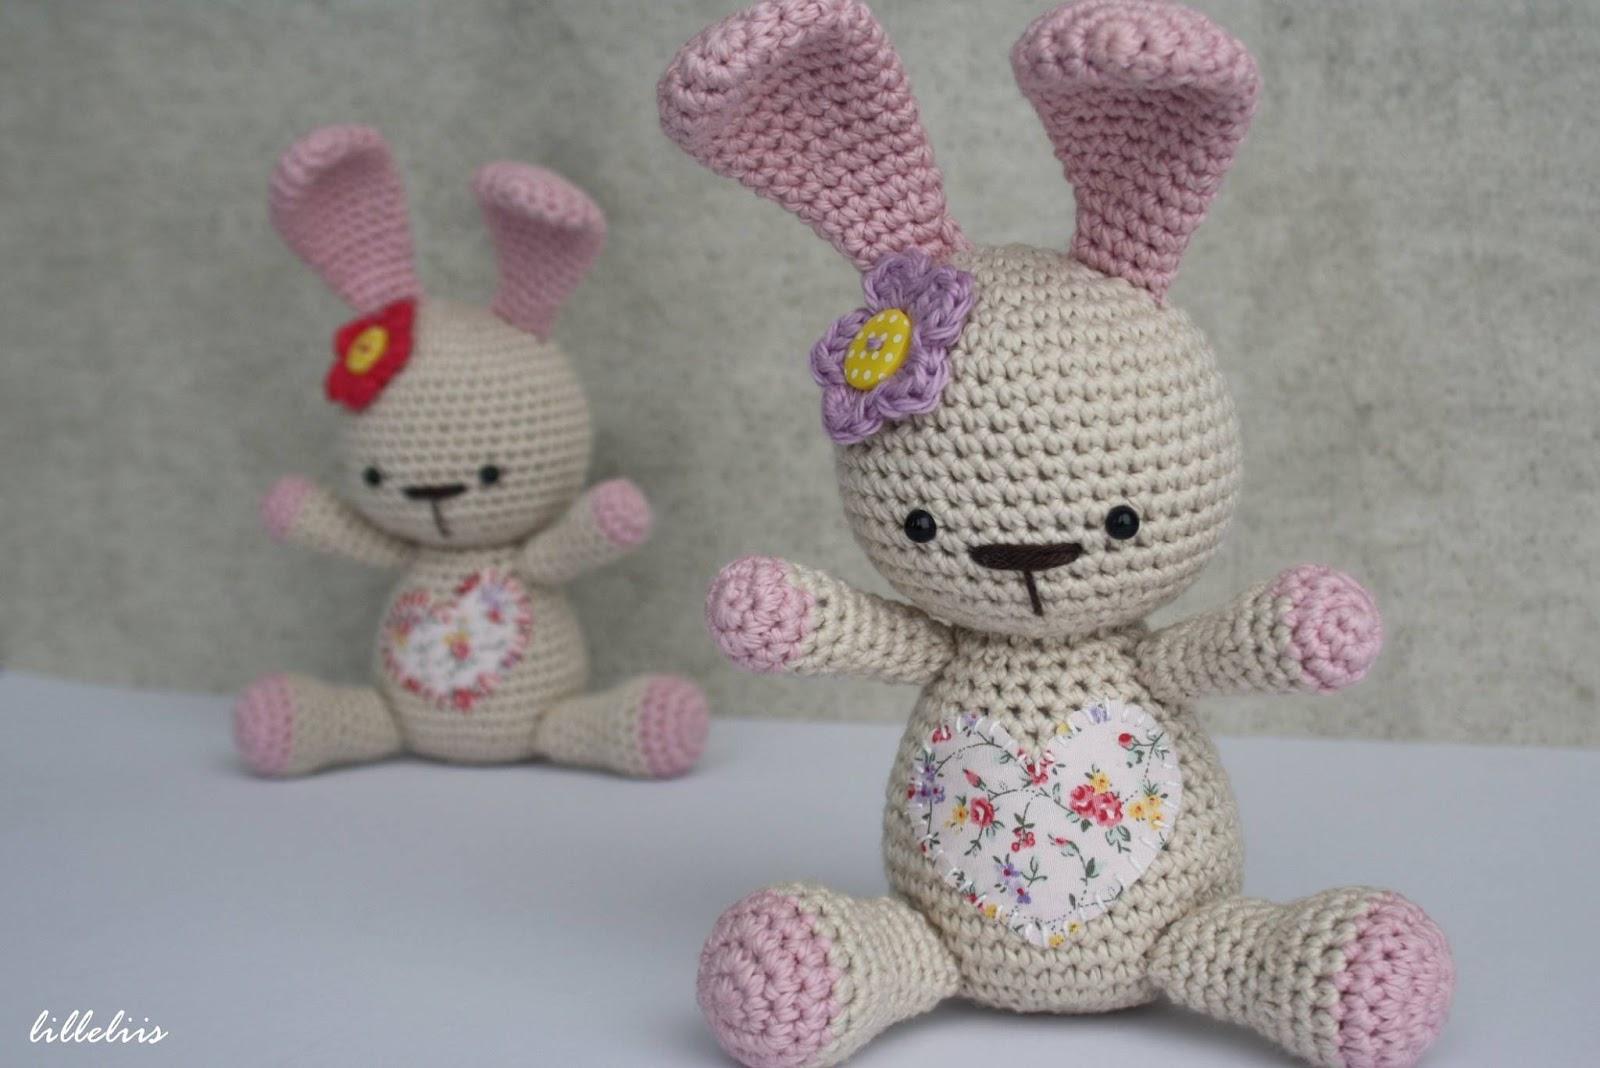 Amigurumi Patterns Rabbit : Amigurumi funny bunny free pattern patterns